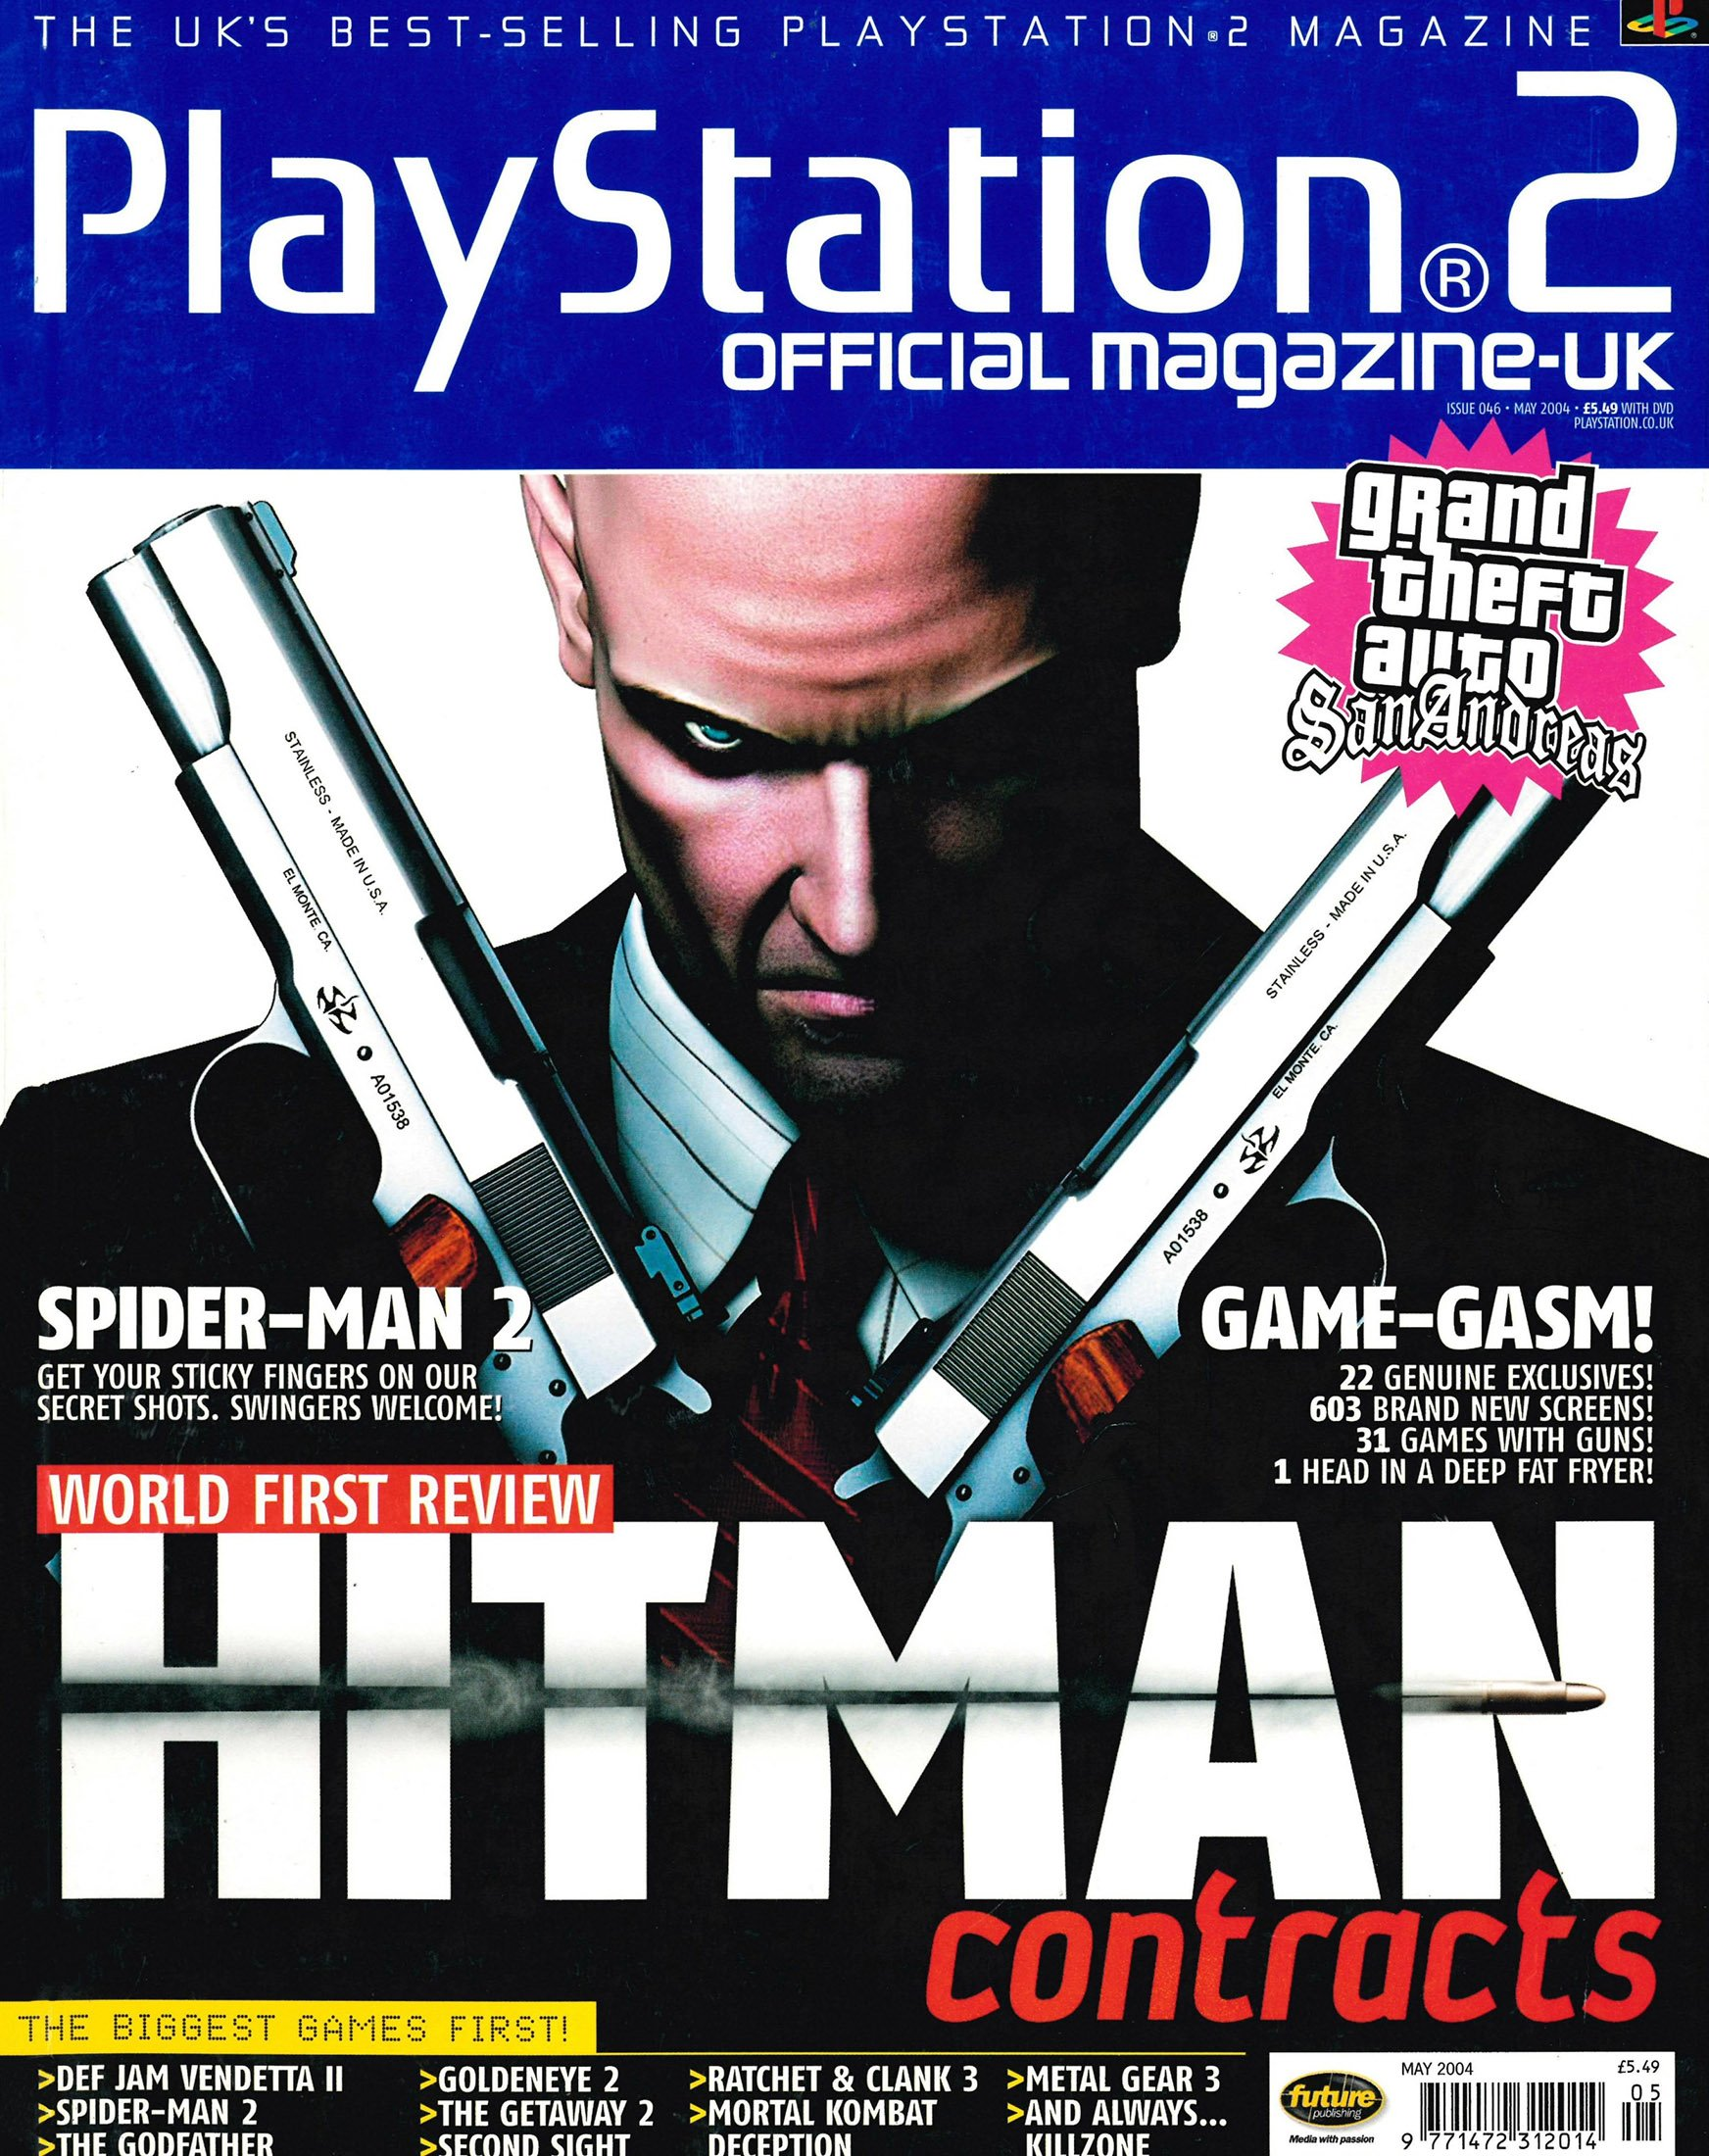 Official Playstation 2 Magazine UK 046 (May 2004)